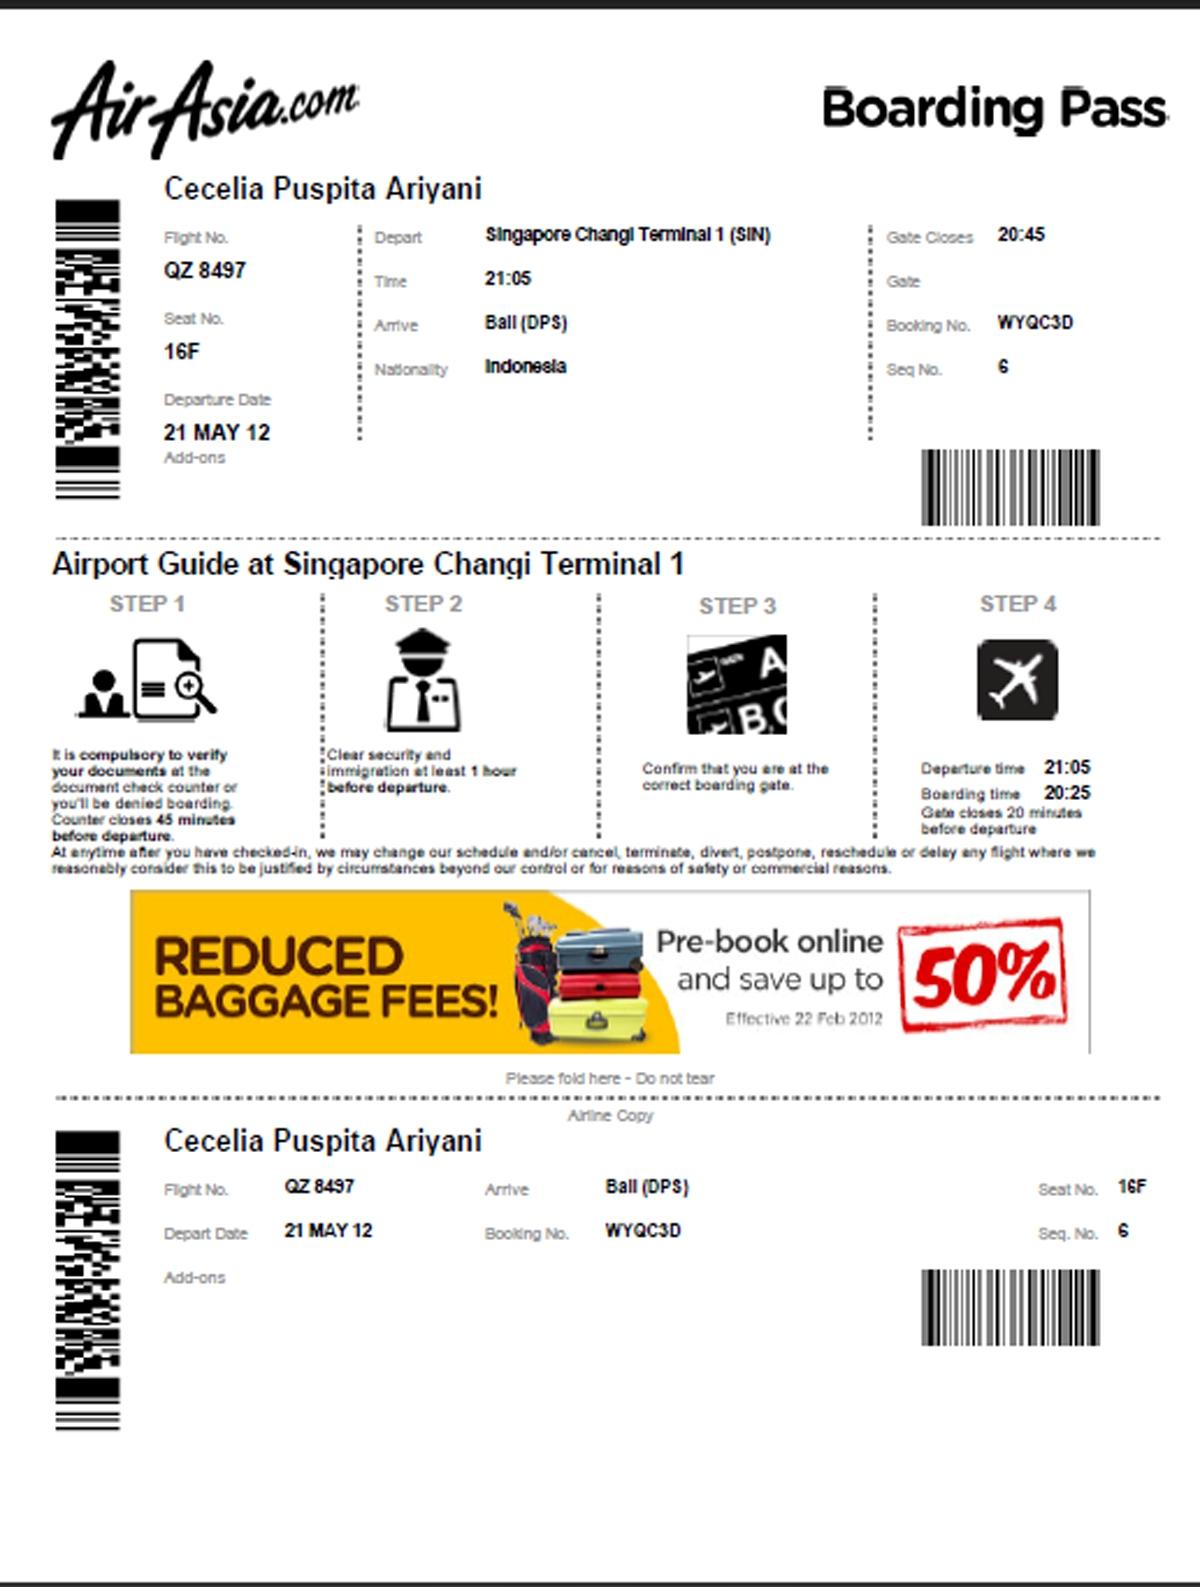 Pelangi Nusantara Tour Travel Ticketing Domestik Airlines Tiket Air Asia Contoh Pesawat E